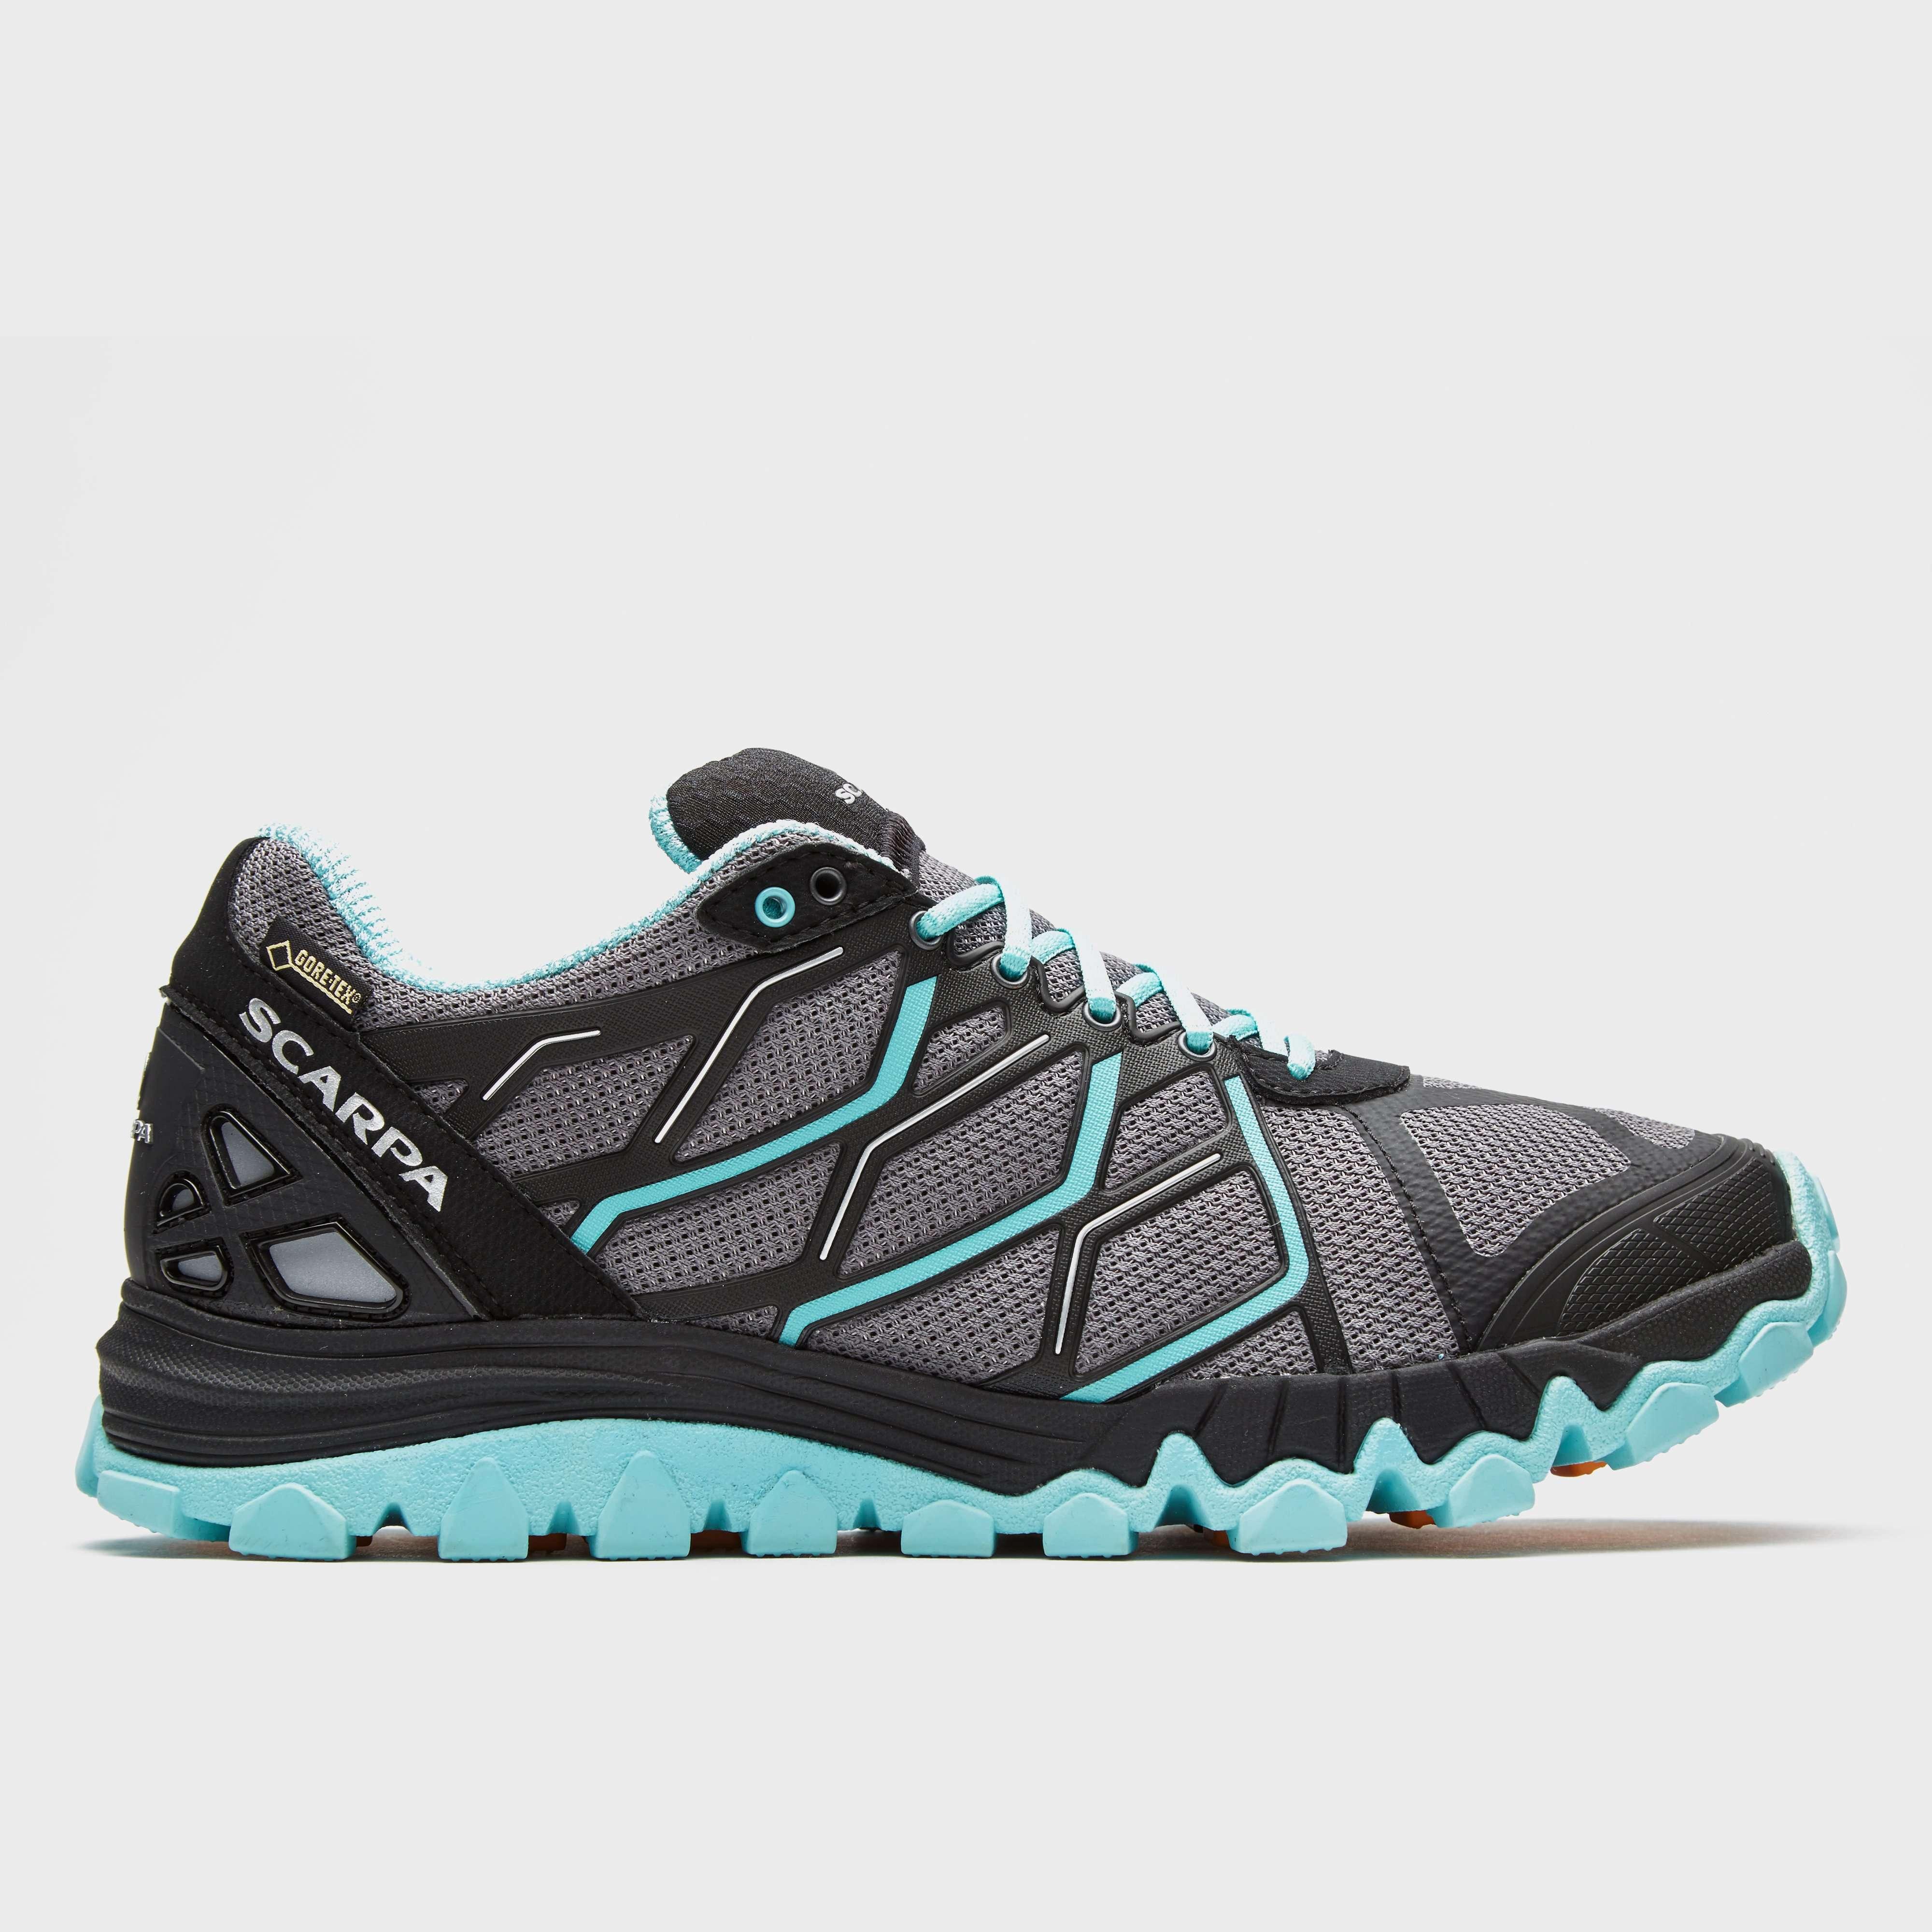 SCARPA Women's Proton GORE-TEX® Running Shoes